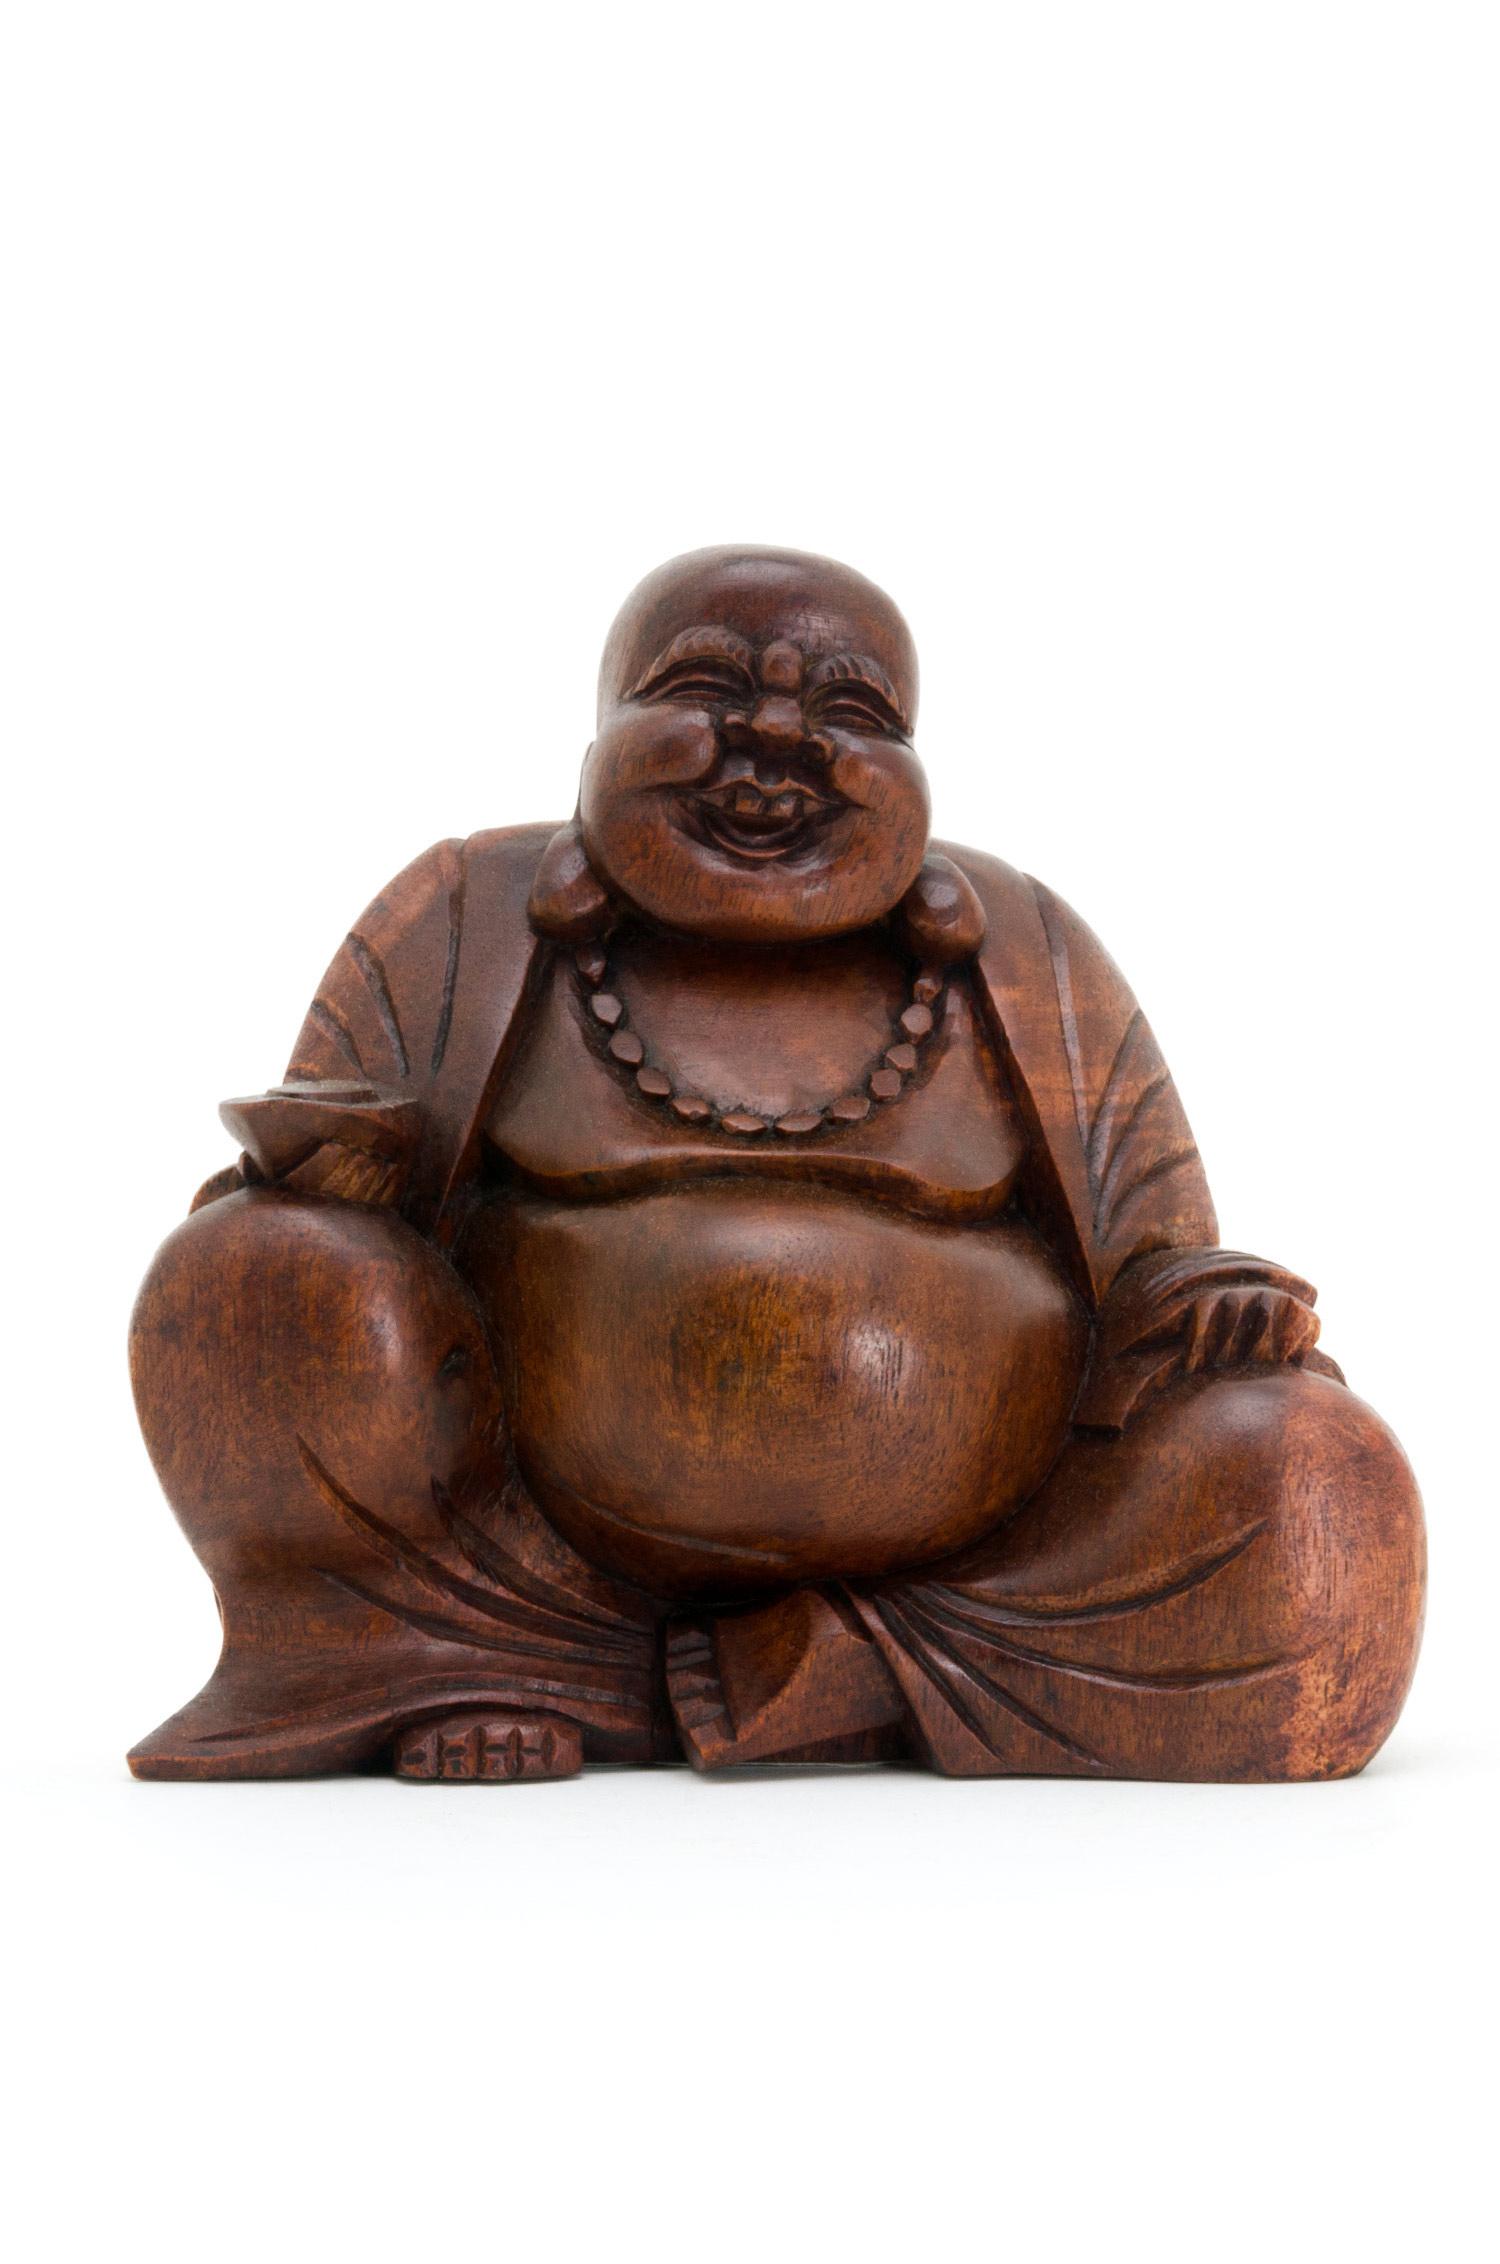 Laughing Buddha 3